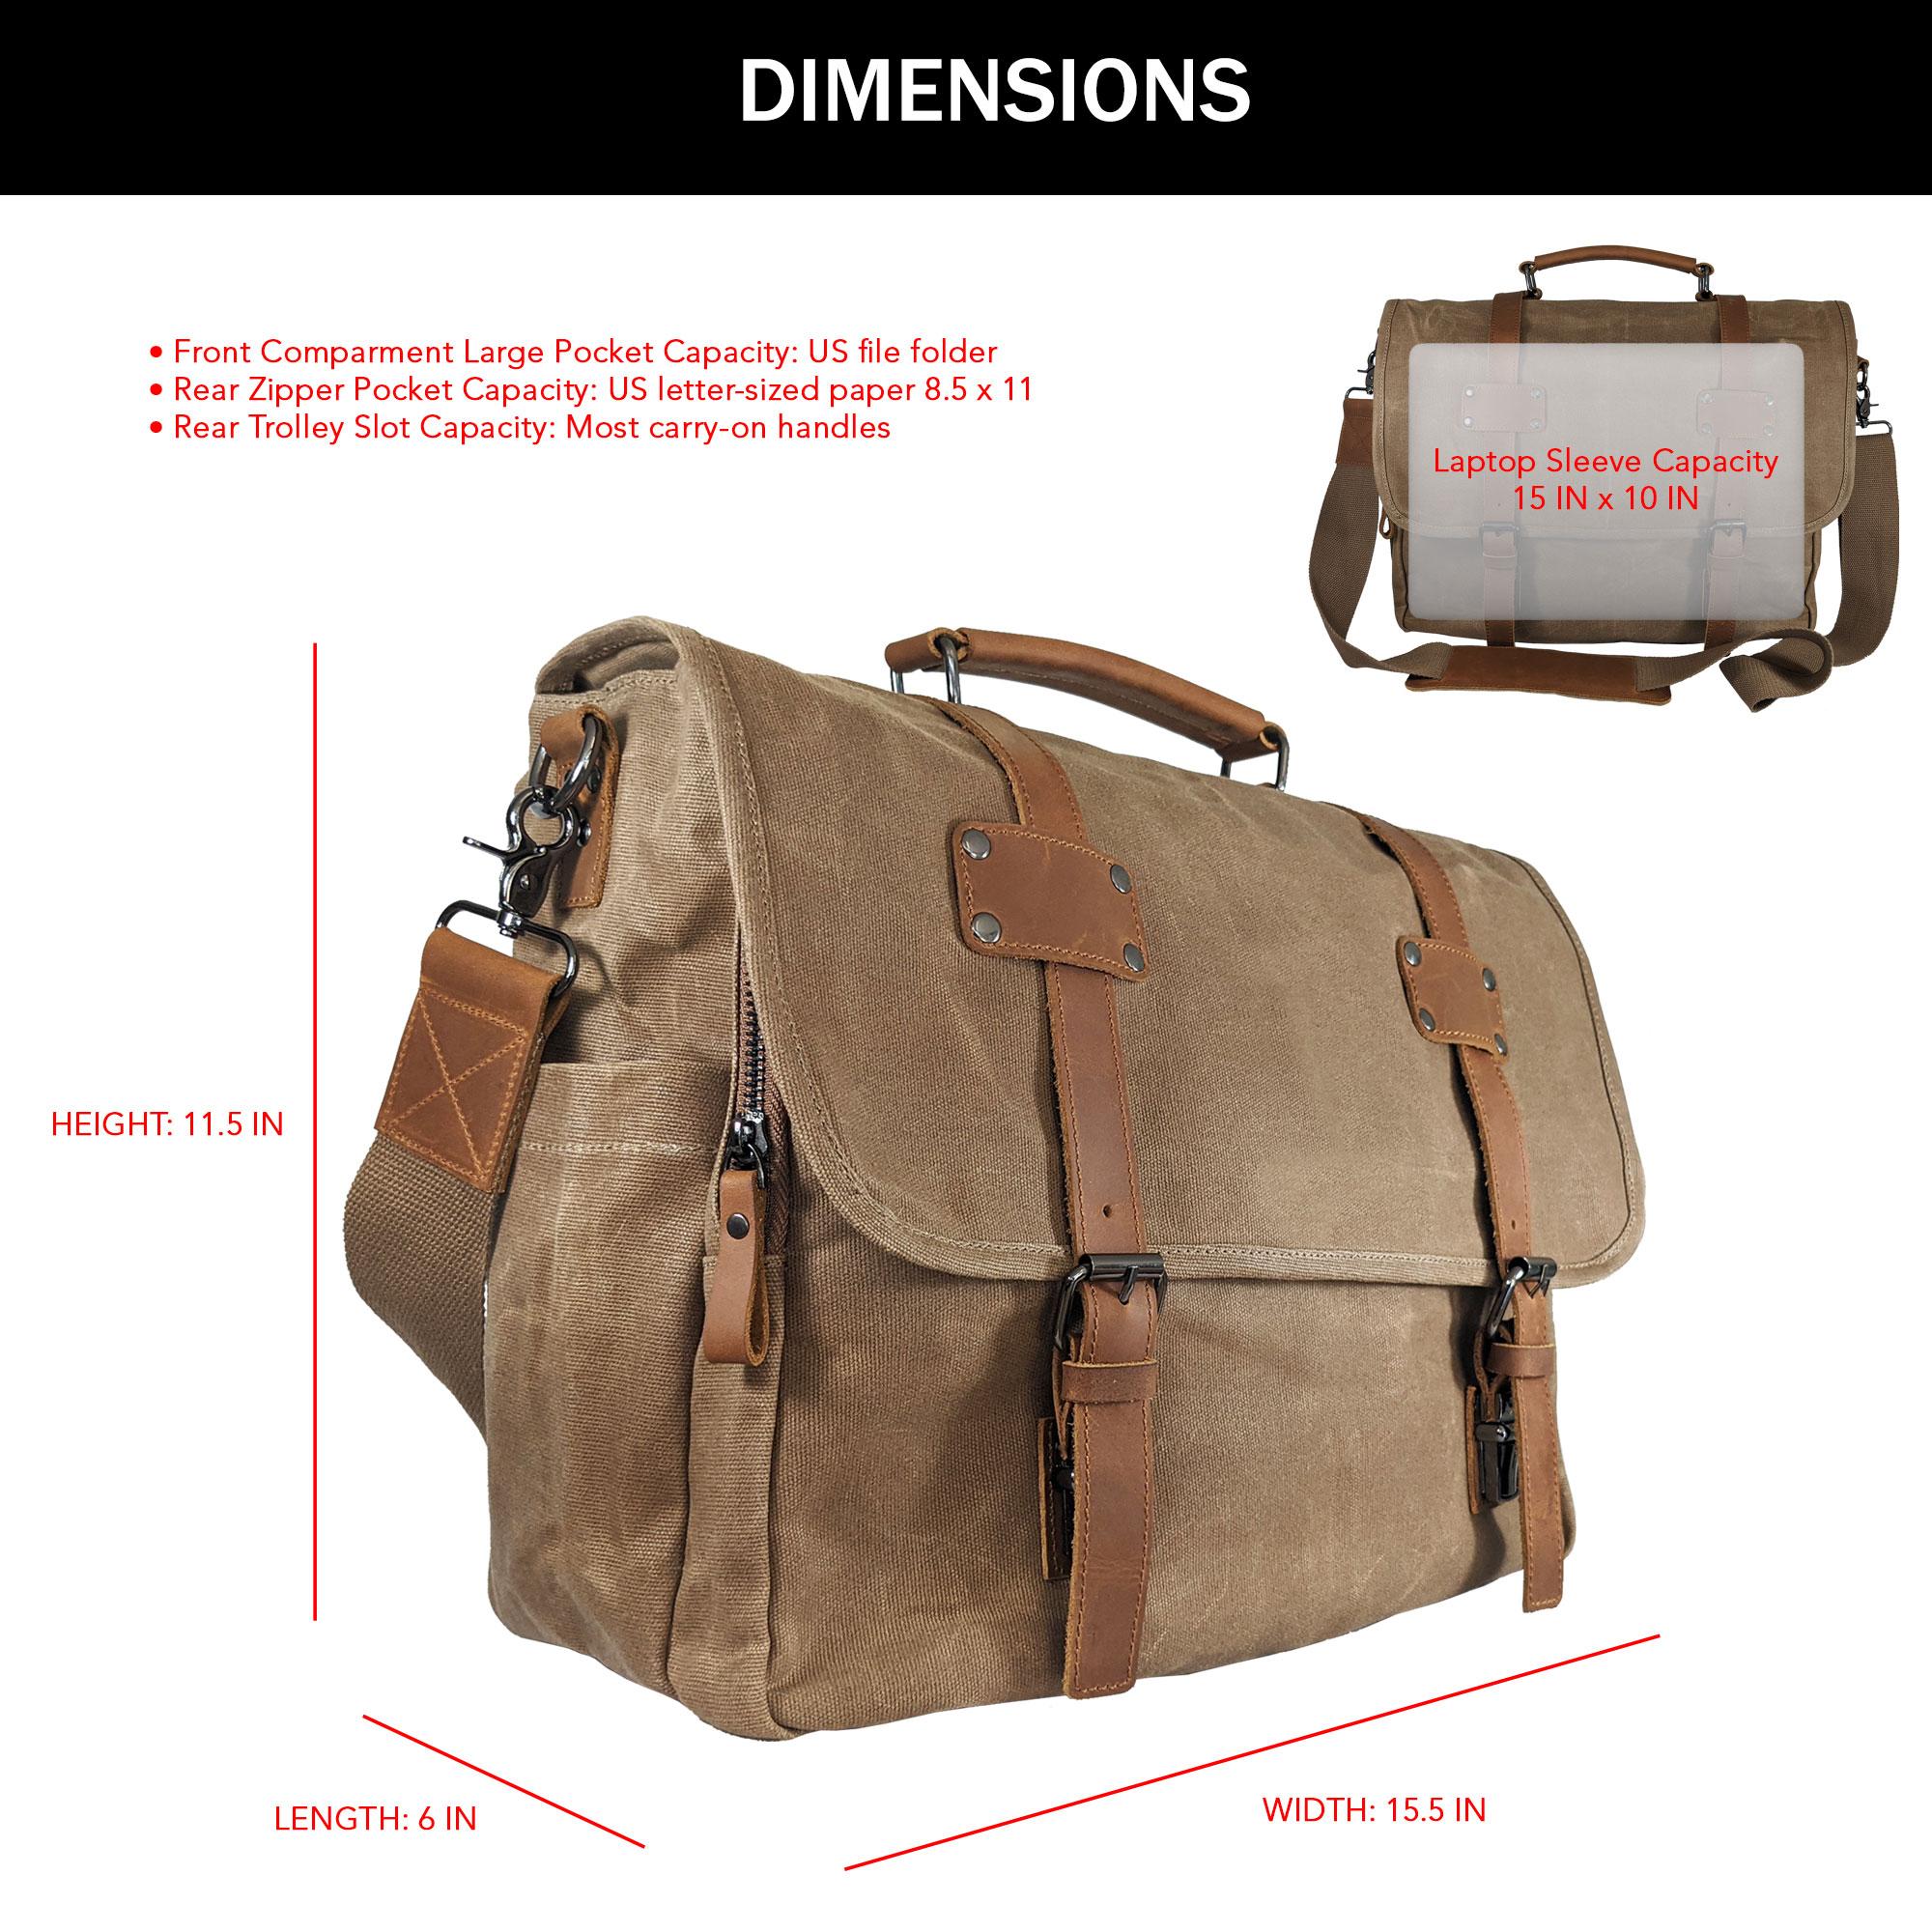 21 09 17 16 41 17 original messenger bag dimensions